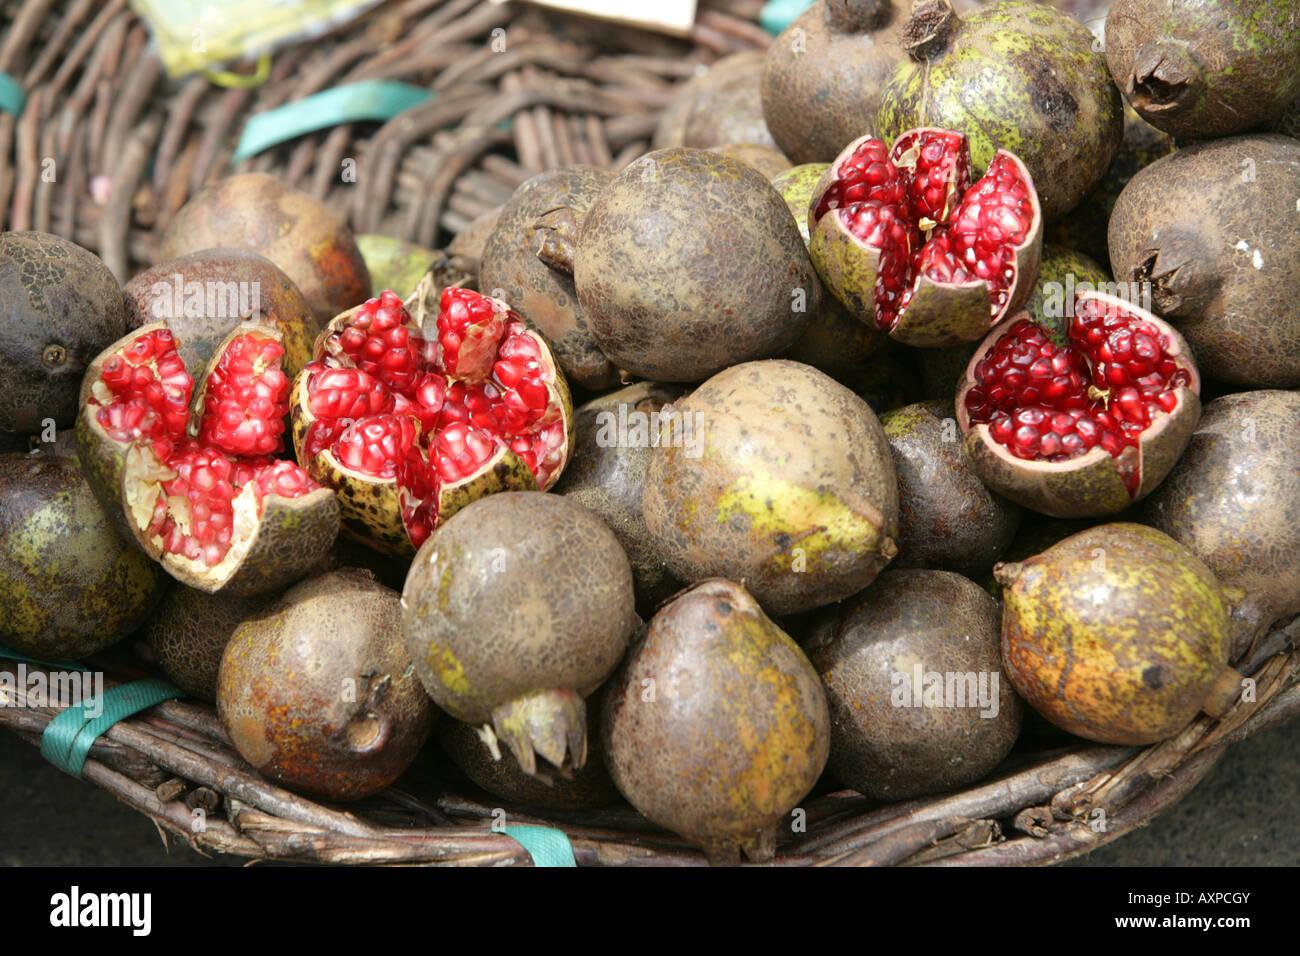 IND India Kerala Trivandrum Vegetable and fruit market ...Kerala Vegetable Market